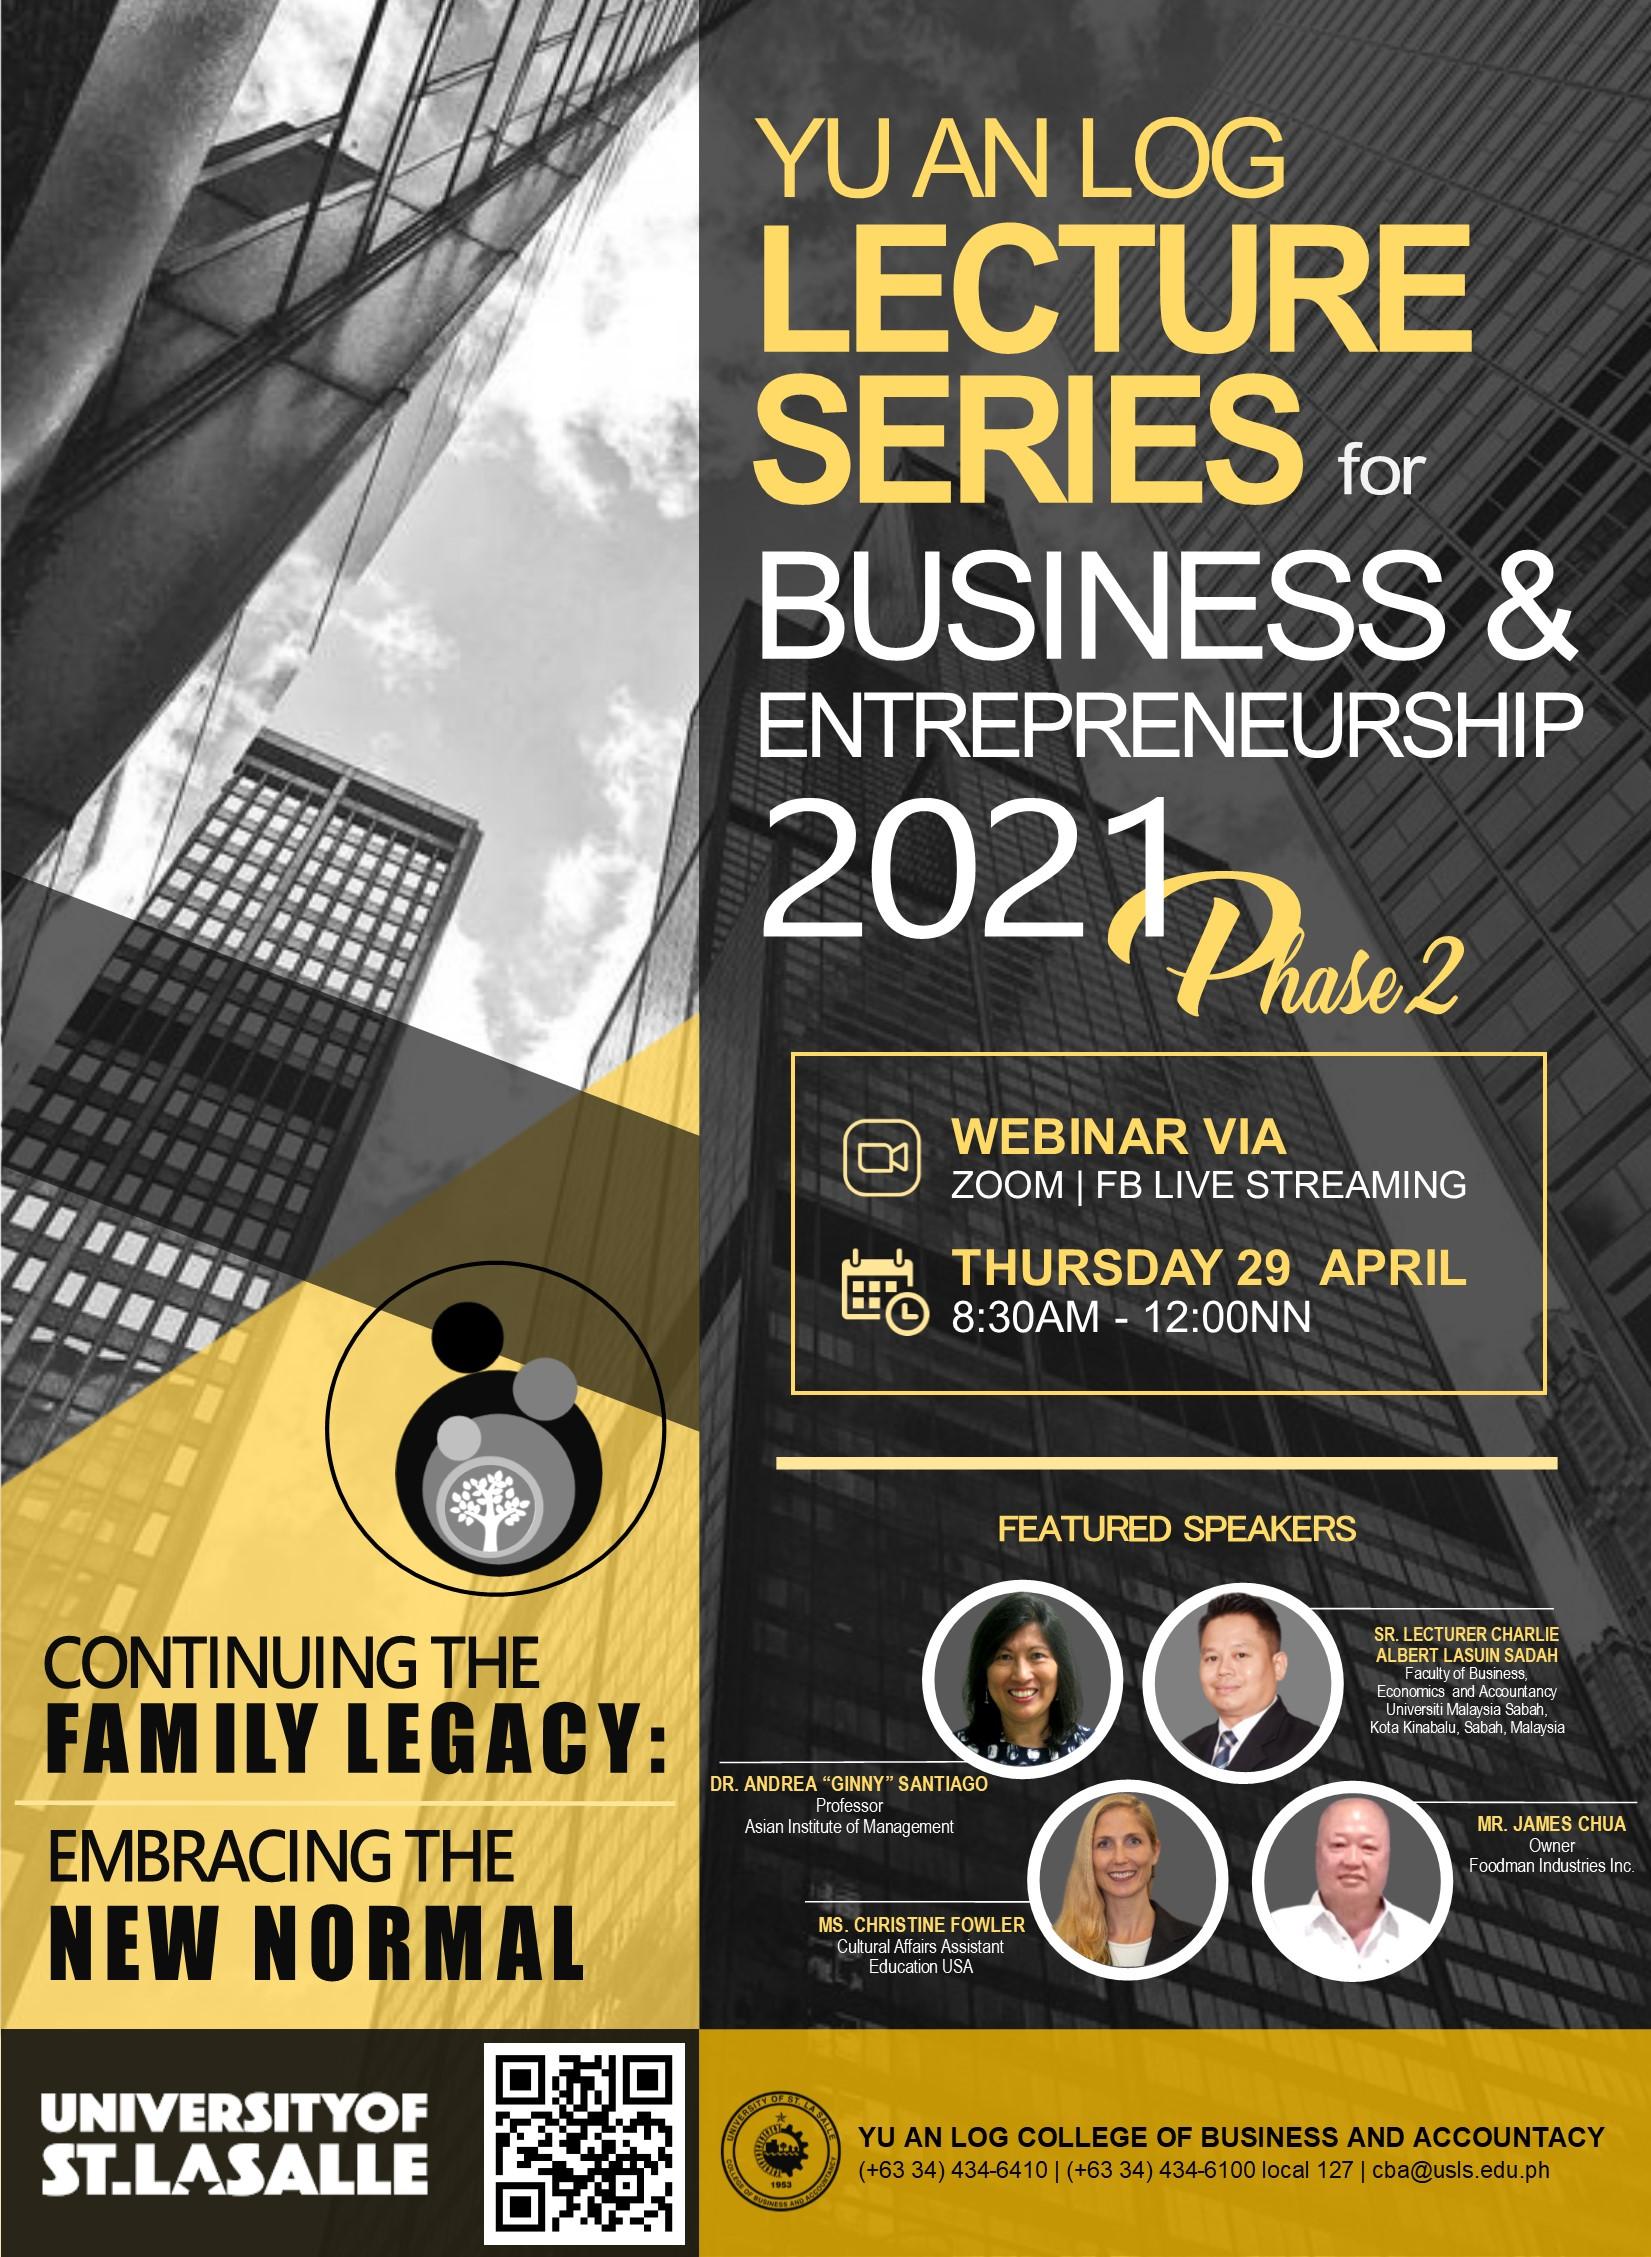 Yu-An-Log-Lecture-Series-for-Business-Entrepreneurship-2021-Phase-2.jpg